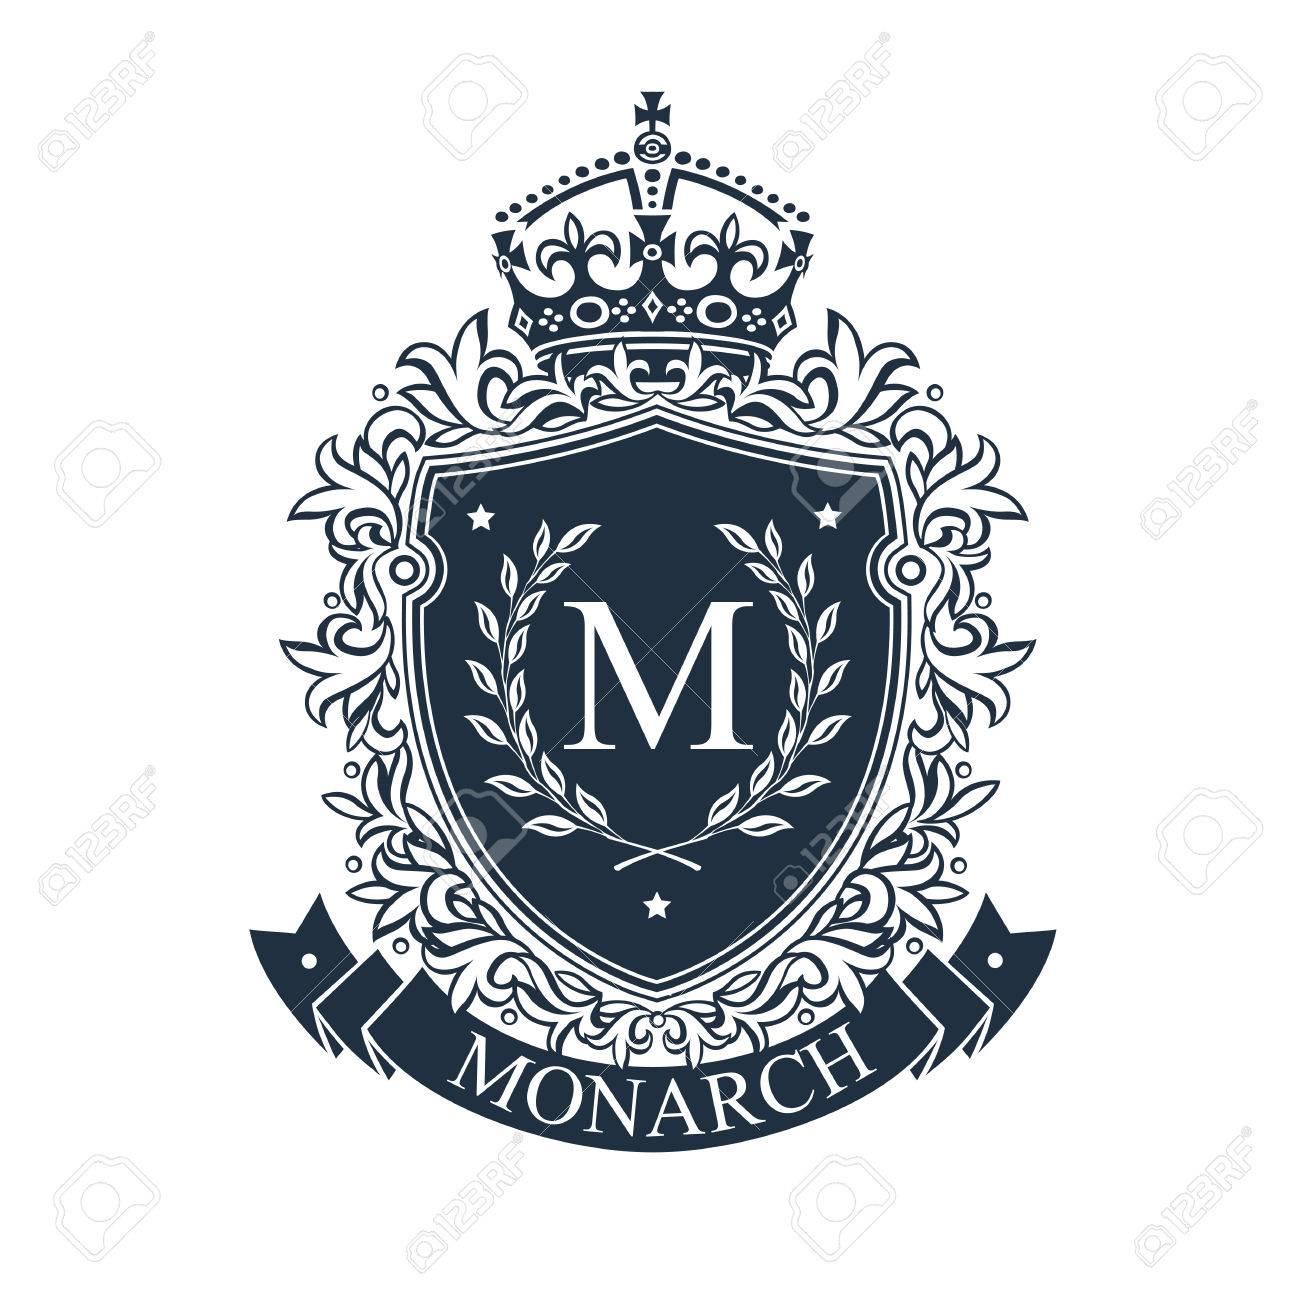 Coat of arms. Heraldic royal emblem shield with crown and laurel wreath. Heraldic vector template. - 82149759